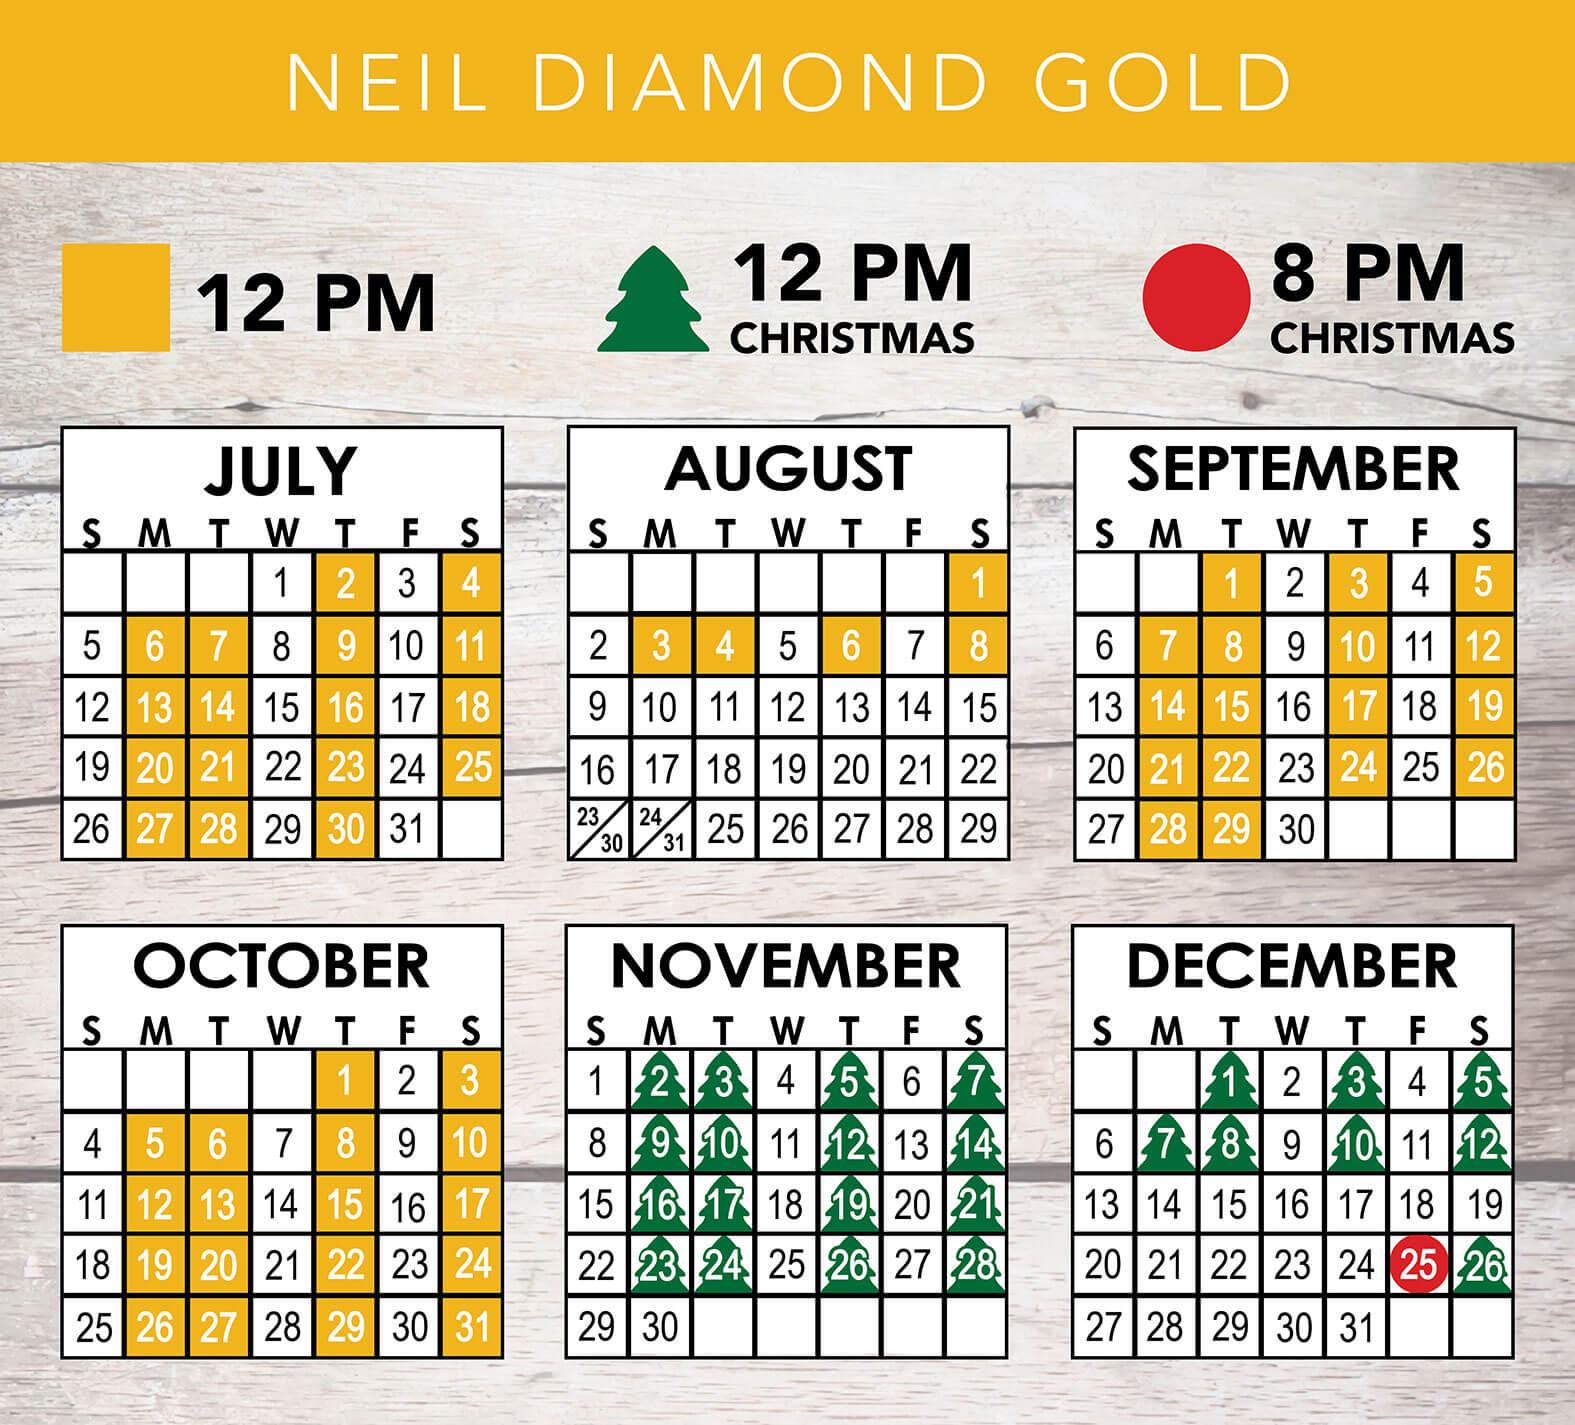 Neil Diamond Gold 2020 Schedule